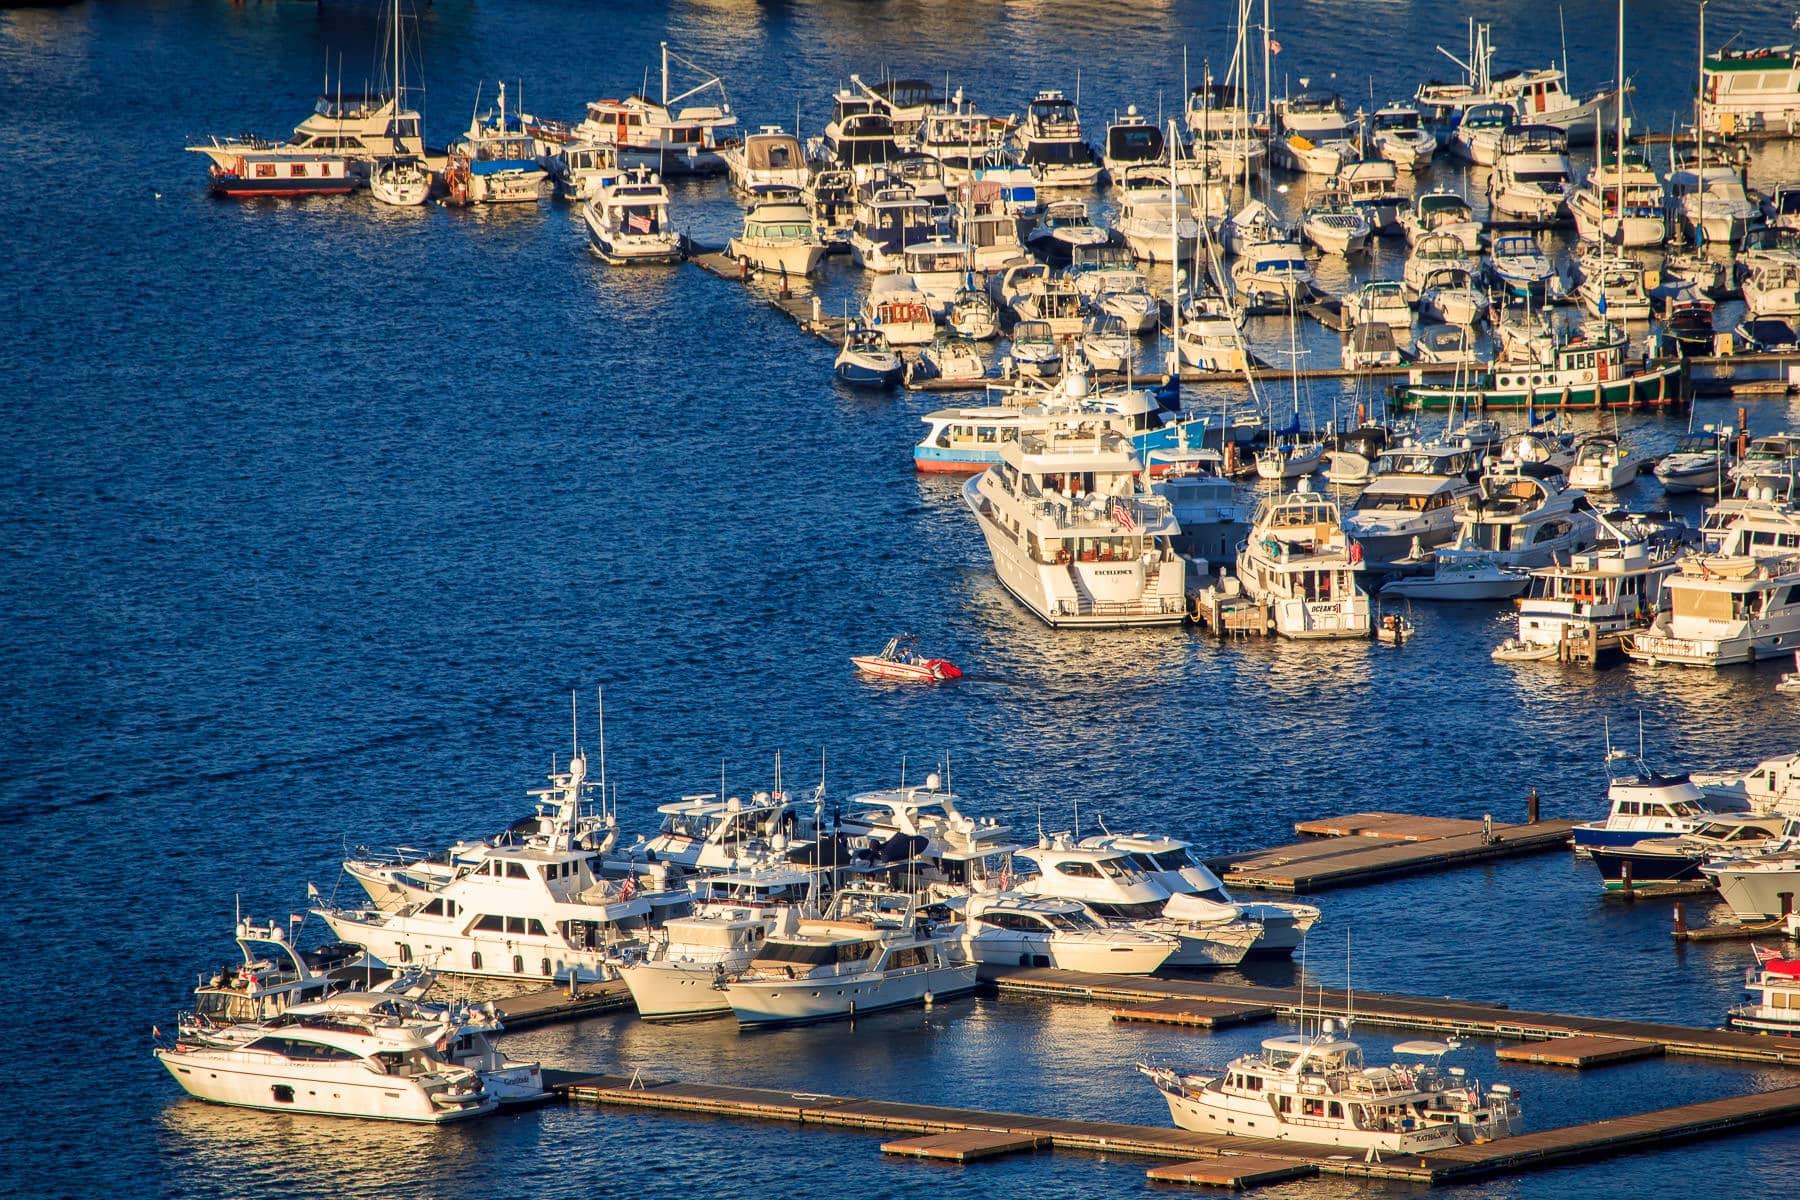 Boats docked at a marina along Seattle's waterfront.